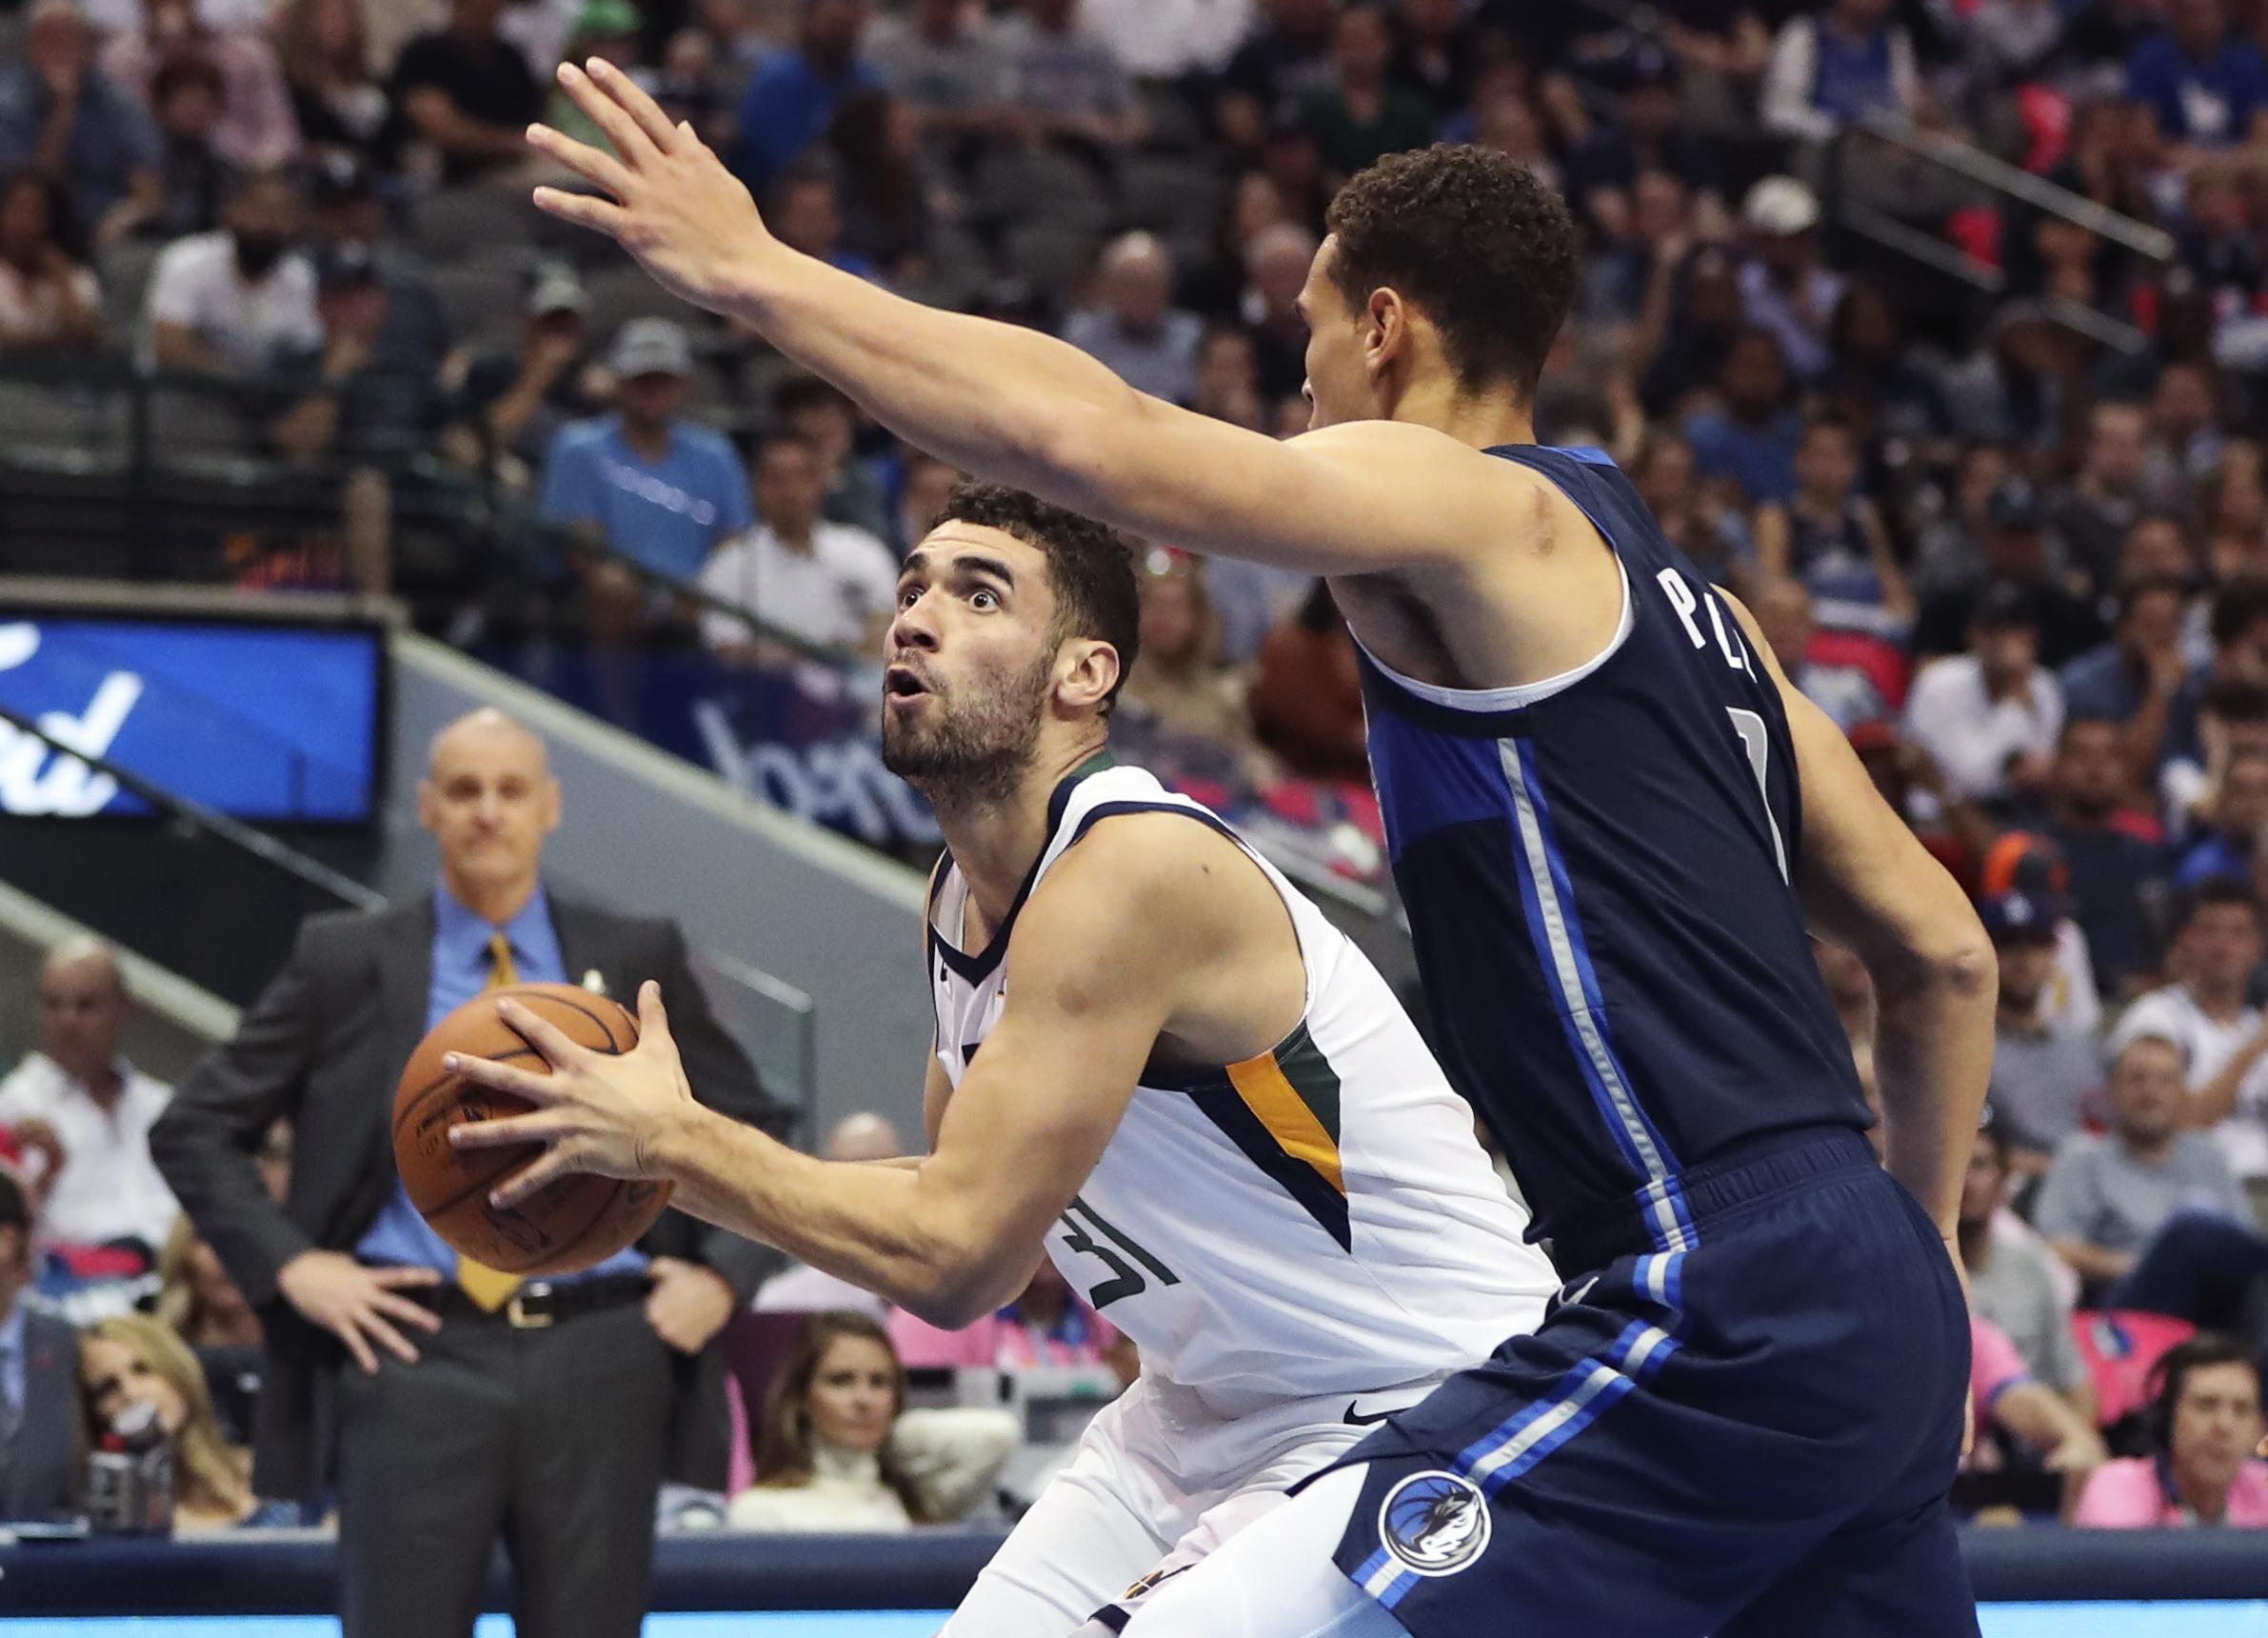 NBA: Utah Jazz at Dallas Mavericks